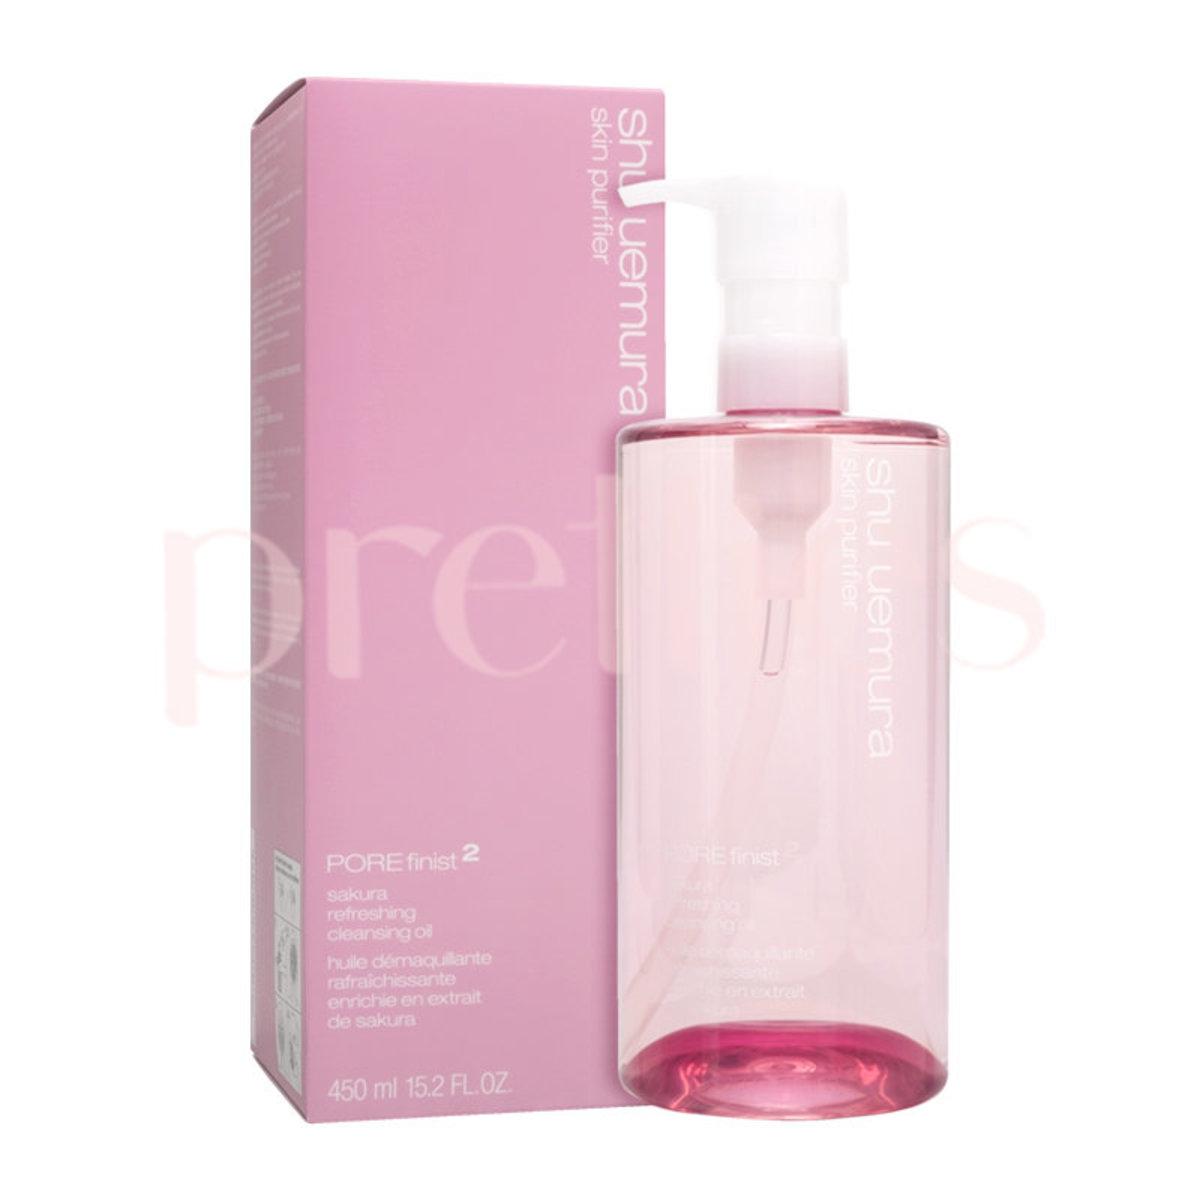 POREfinist Anti-shine fresh Cleansing Oil 450ml (Pink) 4935421652193 (Parallel Import)